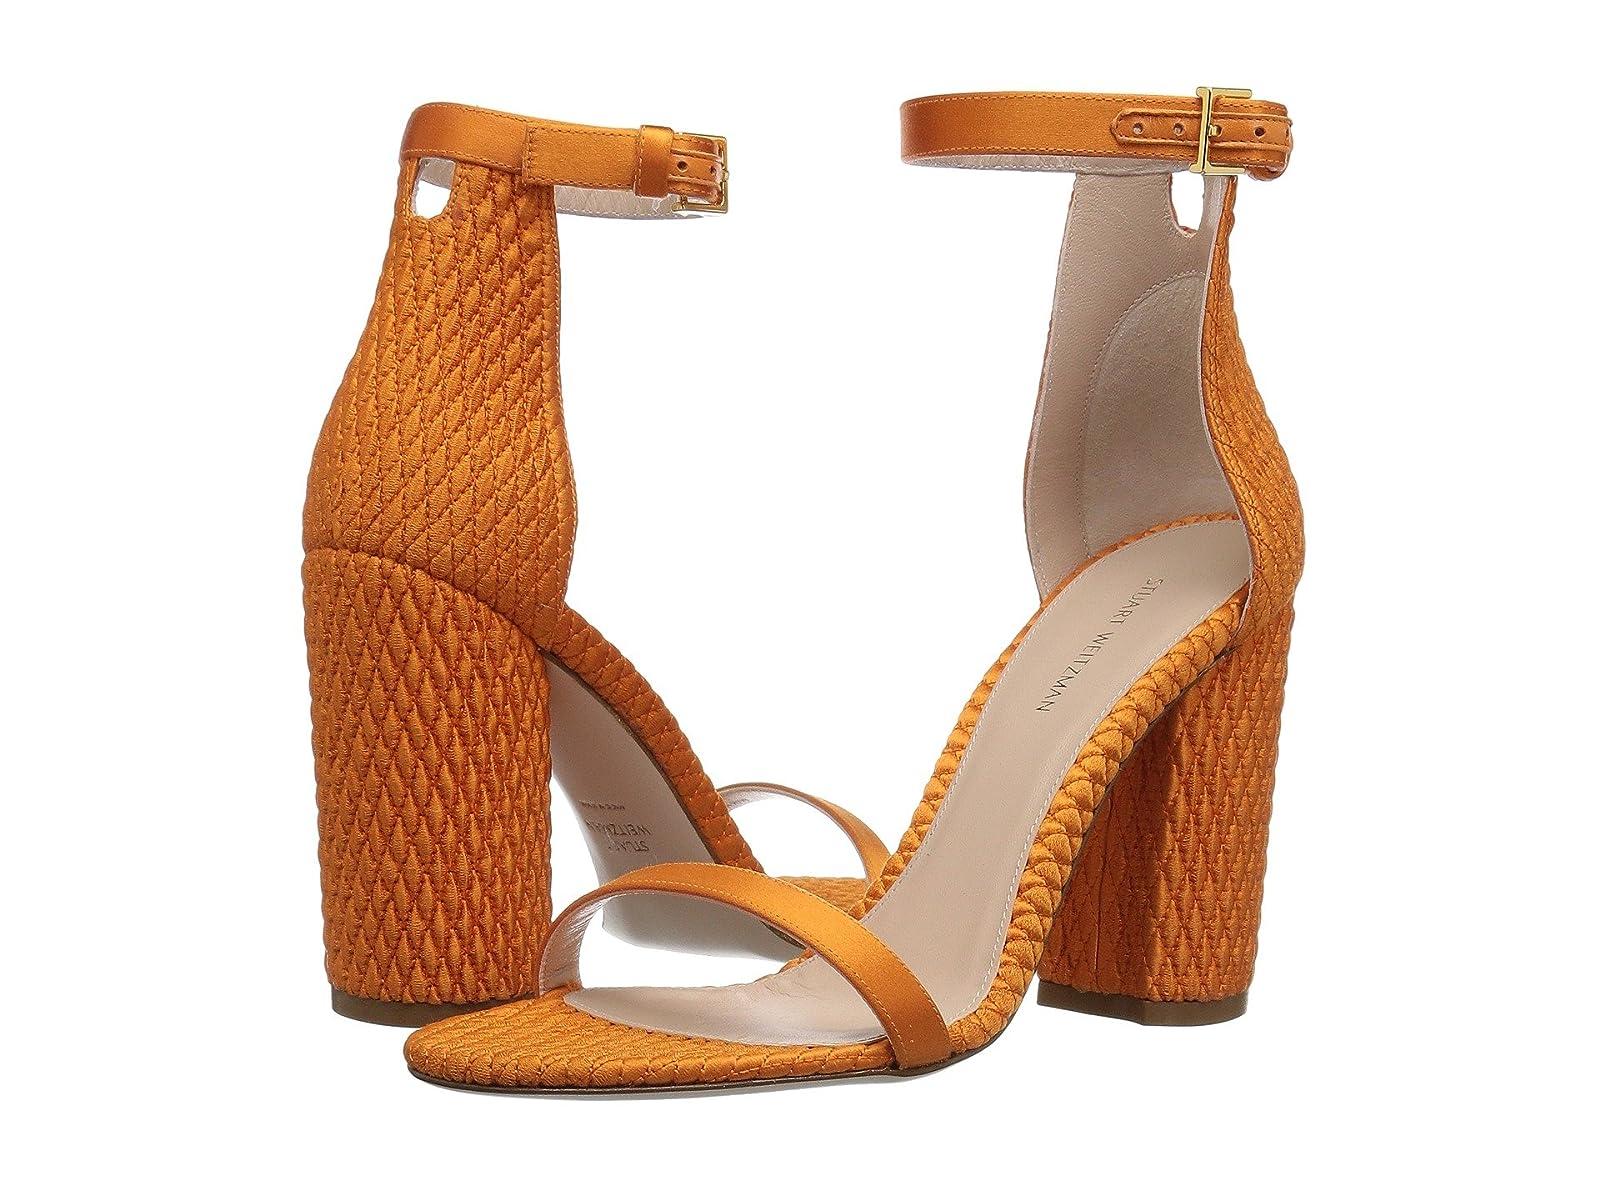 Stuart Weitzman NuquiltCheap and distinctive eye-catching shoes